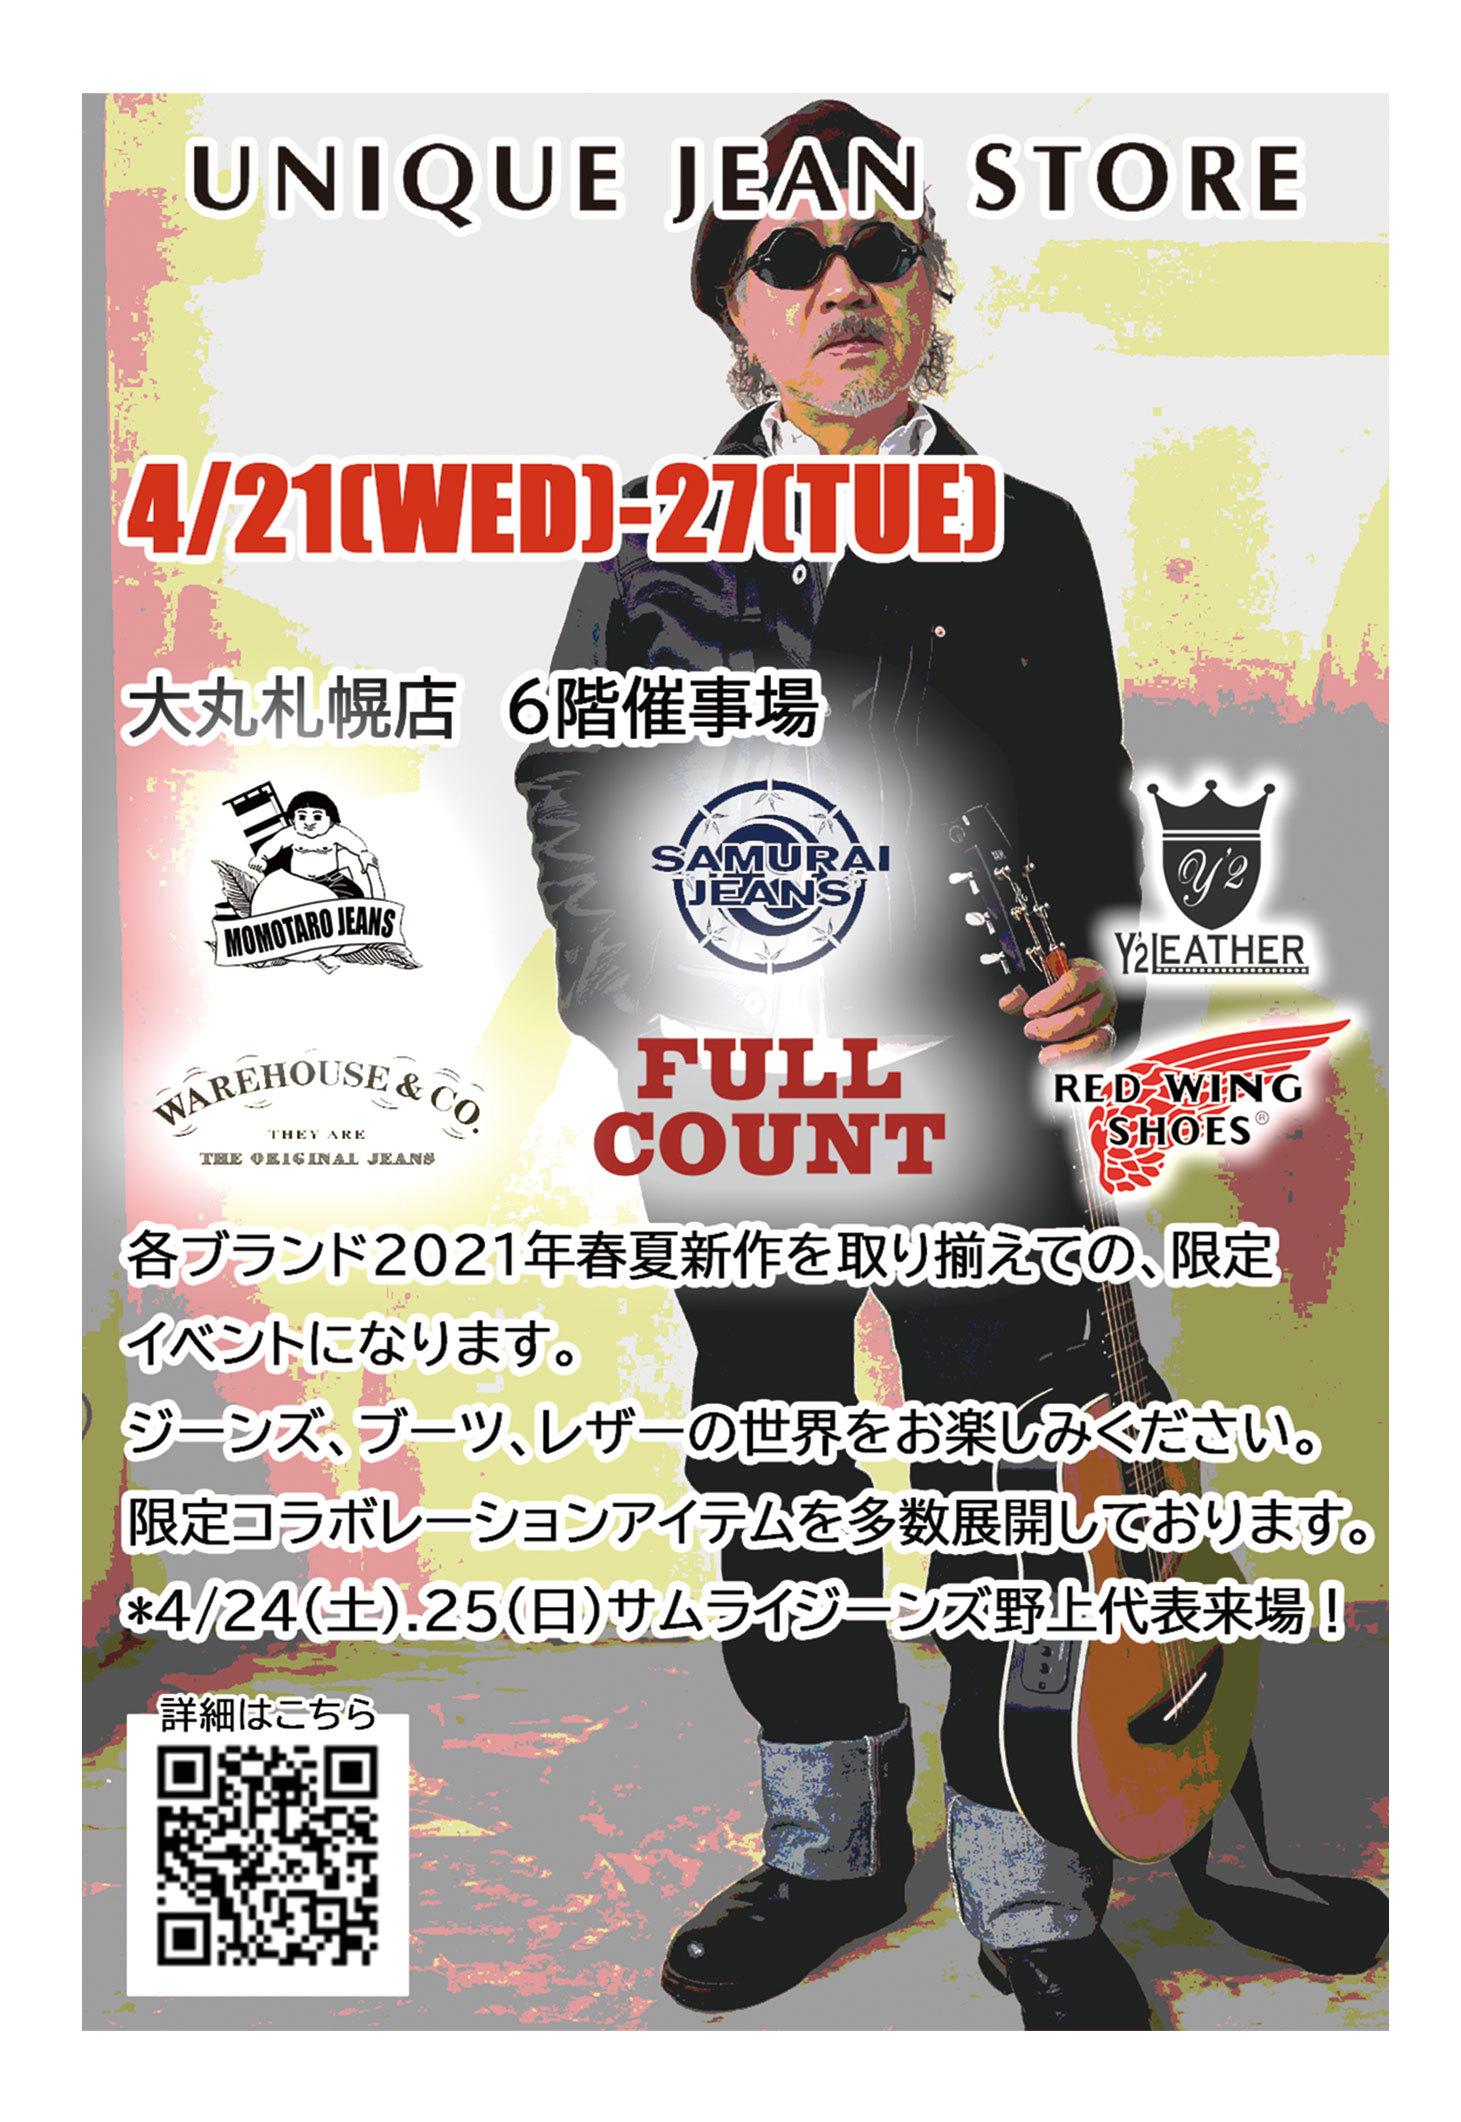 大丸札幌店MAN CAVE MARKET&大丸札幌店UNIQUE JEAN STORE POP-UP _c0204678_16401154.jpg